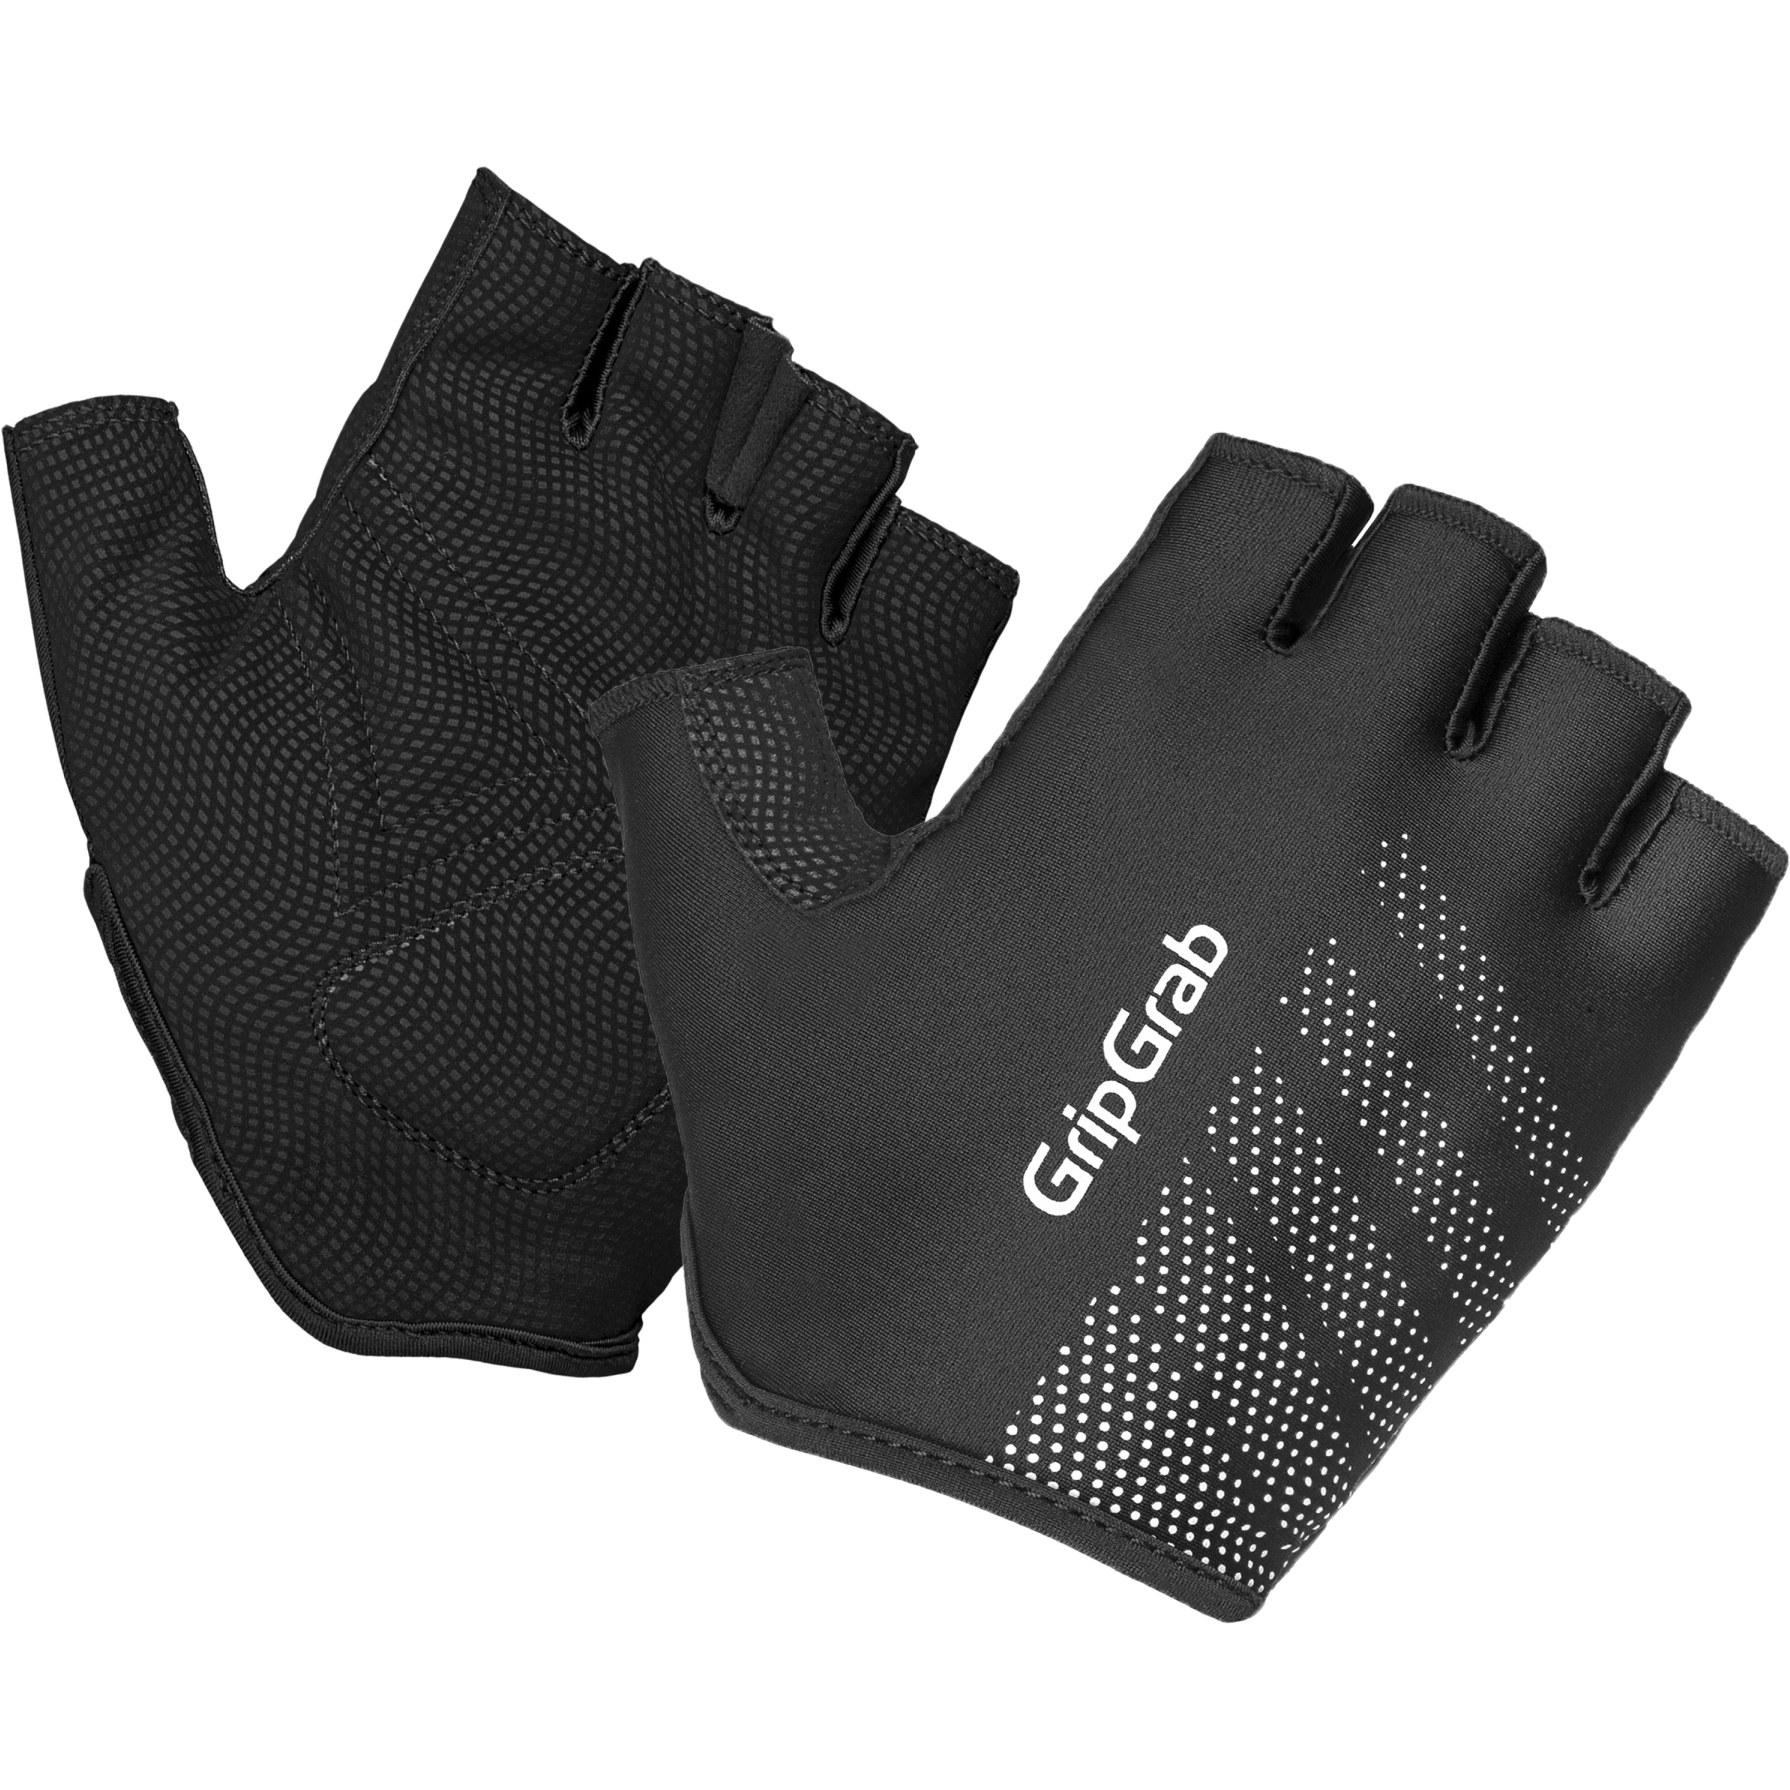 GripGrab Ride Lightweight Padded Short Finger Glove - Black